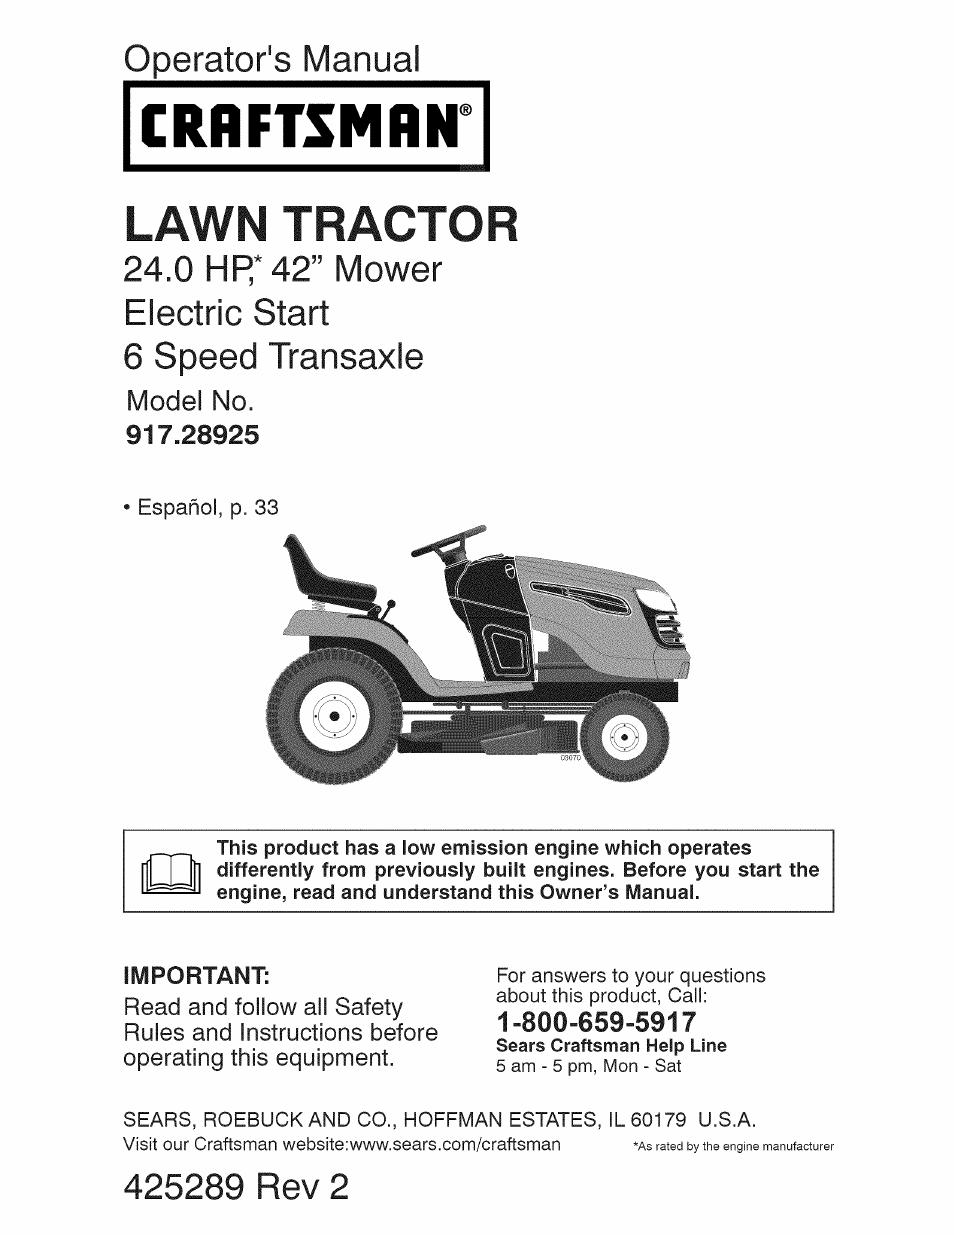 craftsman 917 28925 user manual 64 pages rh manualsdir com Craftsman LT2000 Riding Mower Parts craftsman electric lawn mower manual